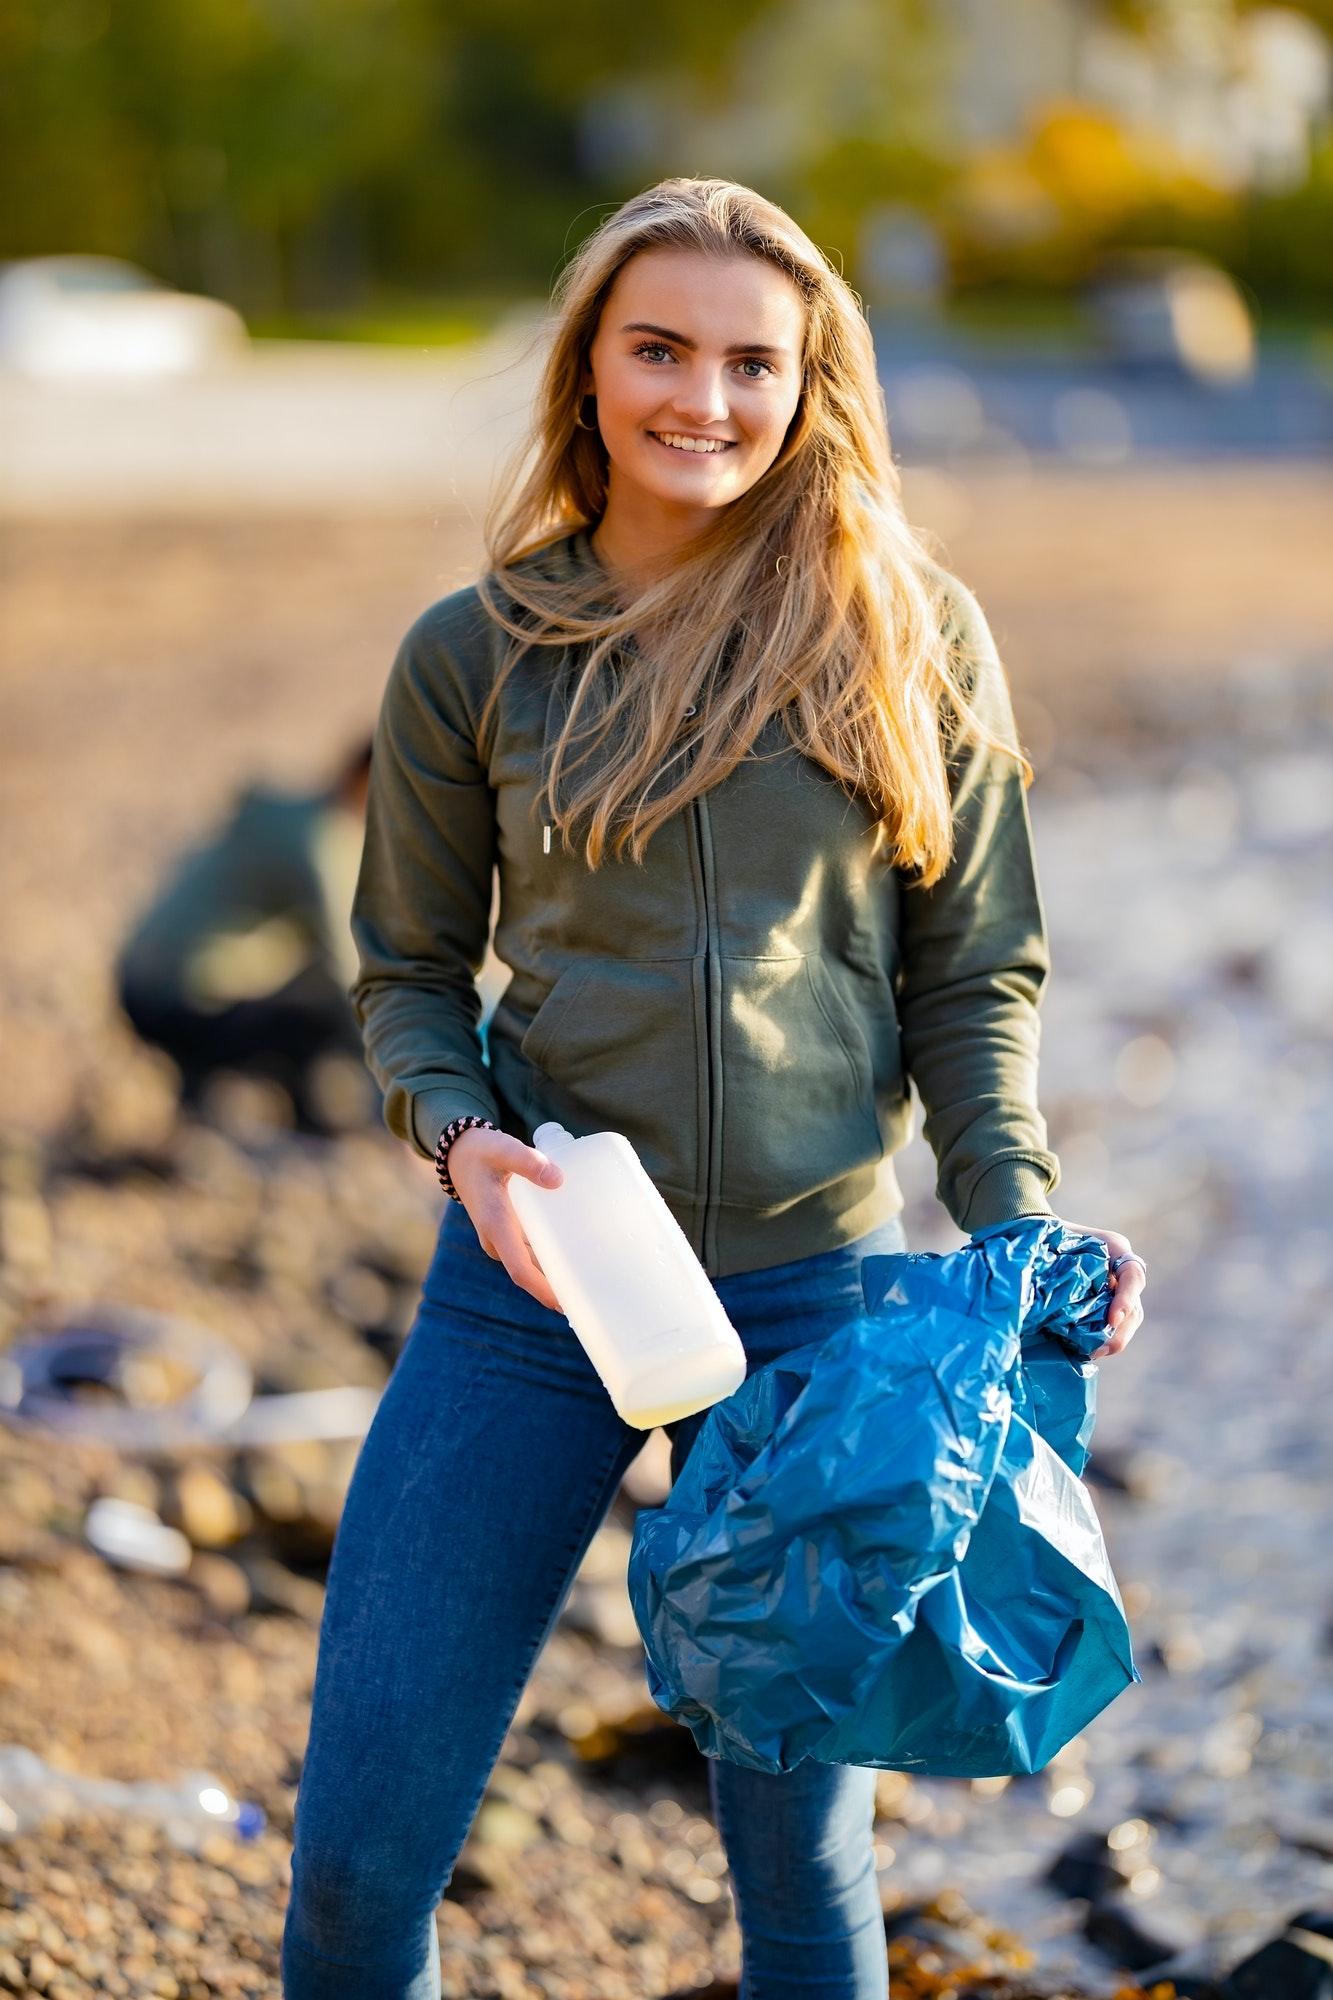 smiling-female-volunteer-holding-bottle-and-garbage-bag-at-beach.jpg